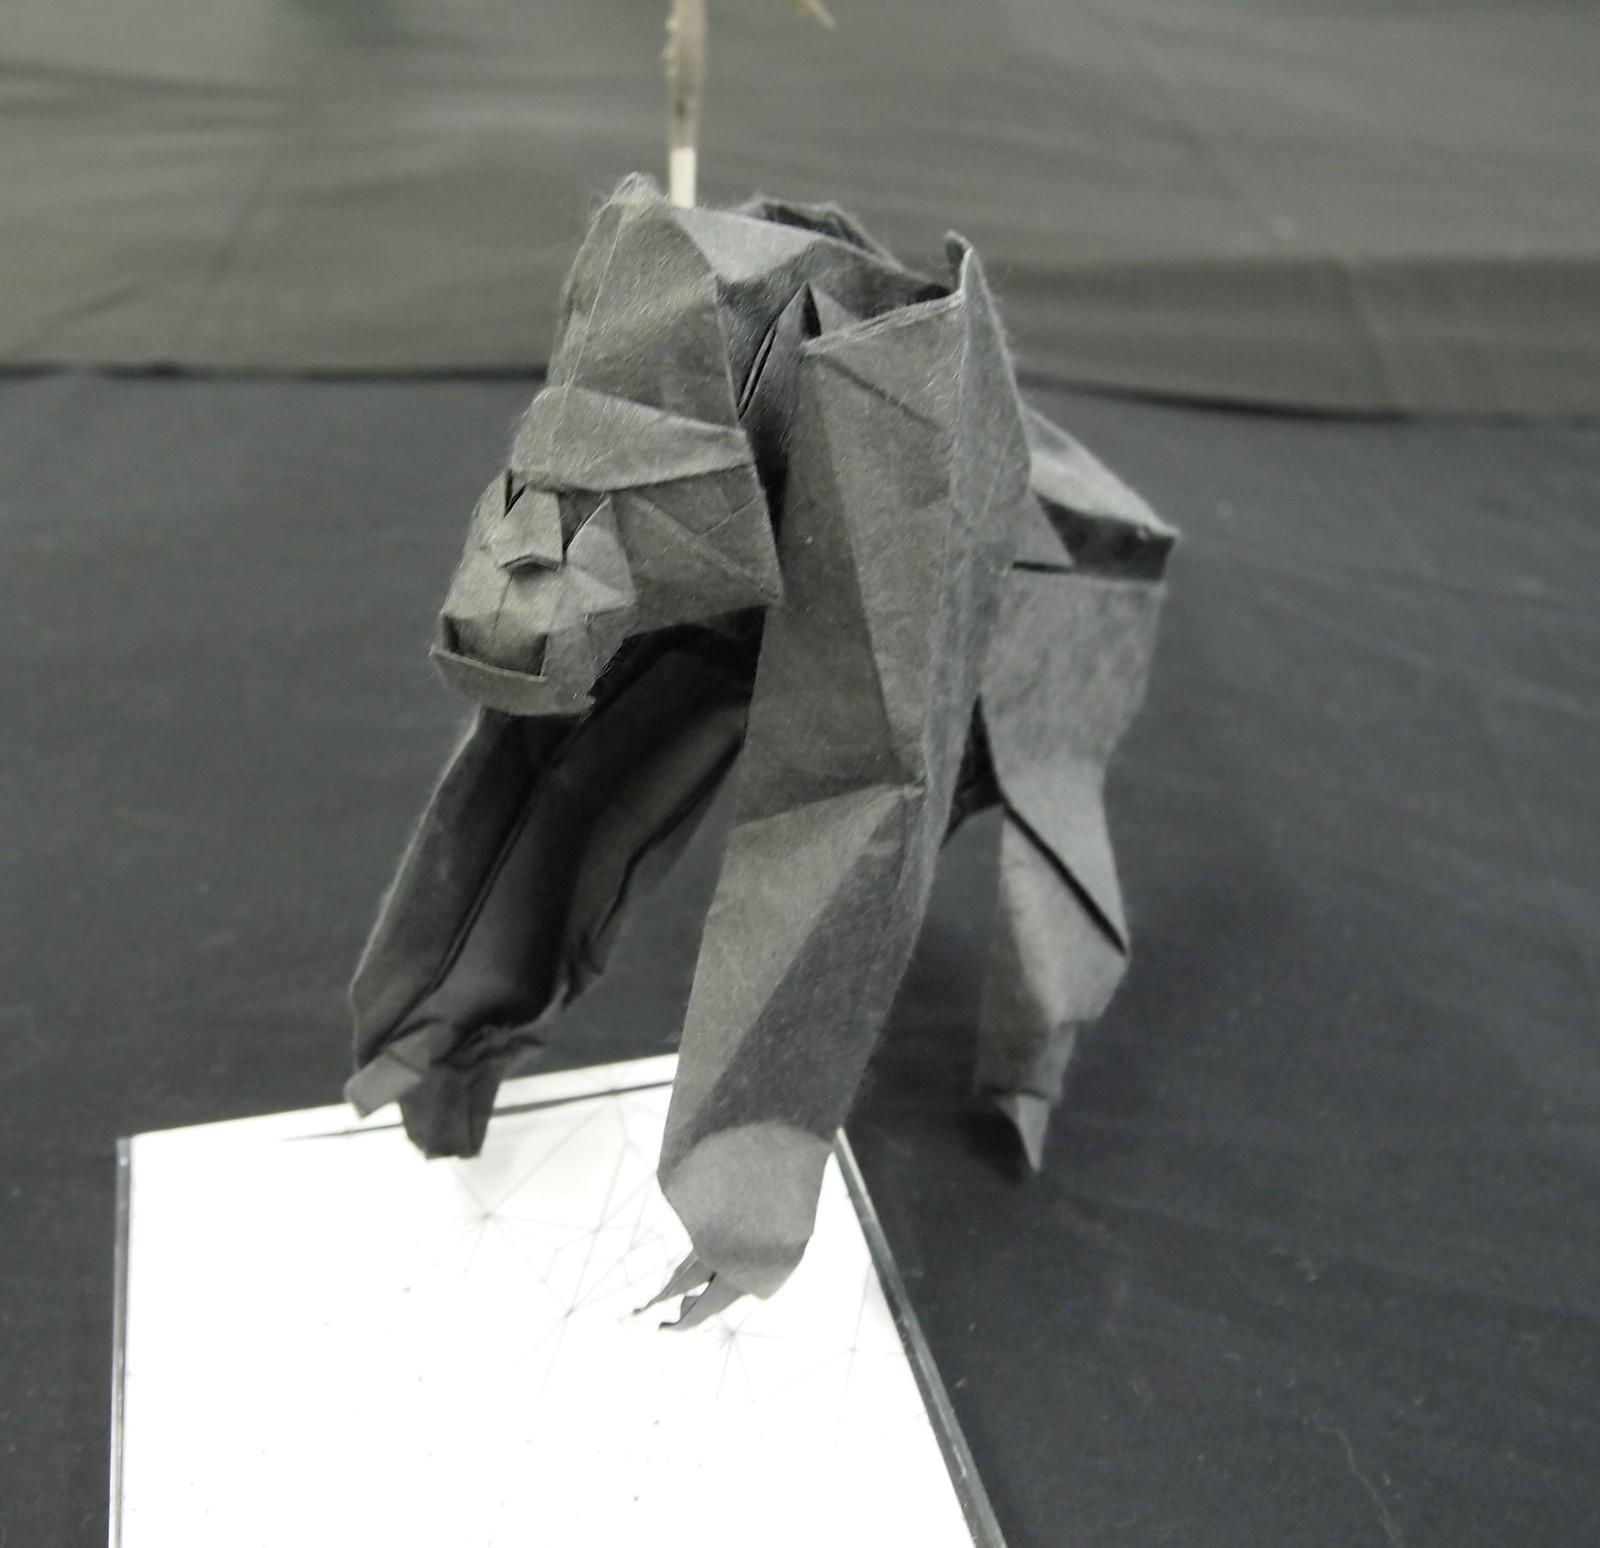 22th Origami Tanteidan Convention. Exhibition of Yuta Katsuzaki